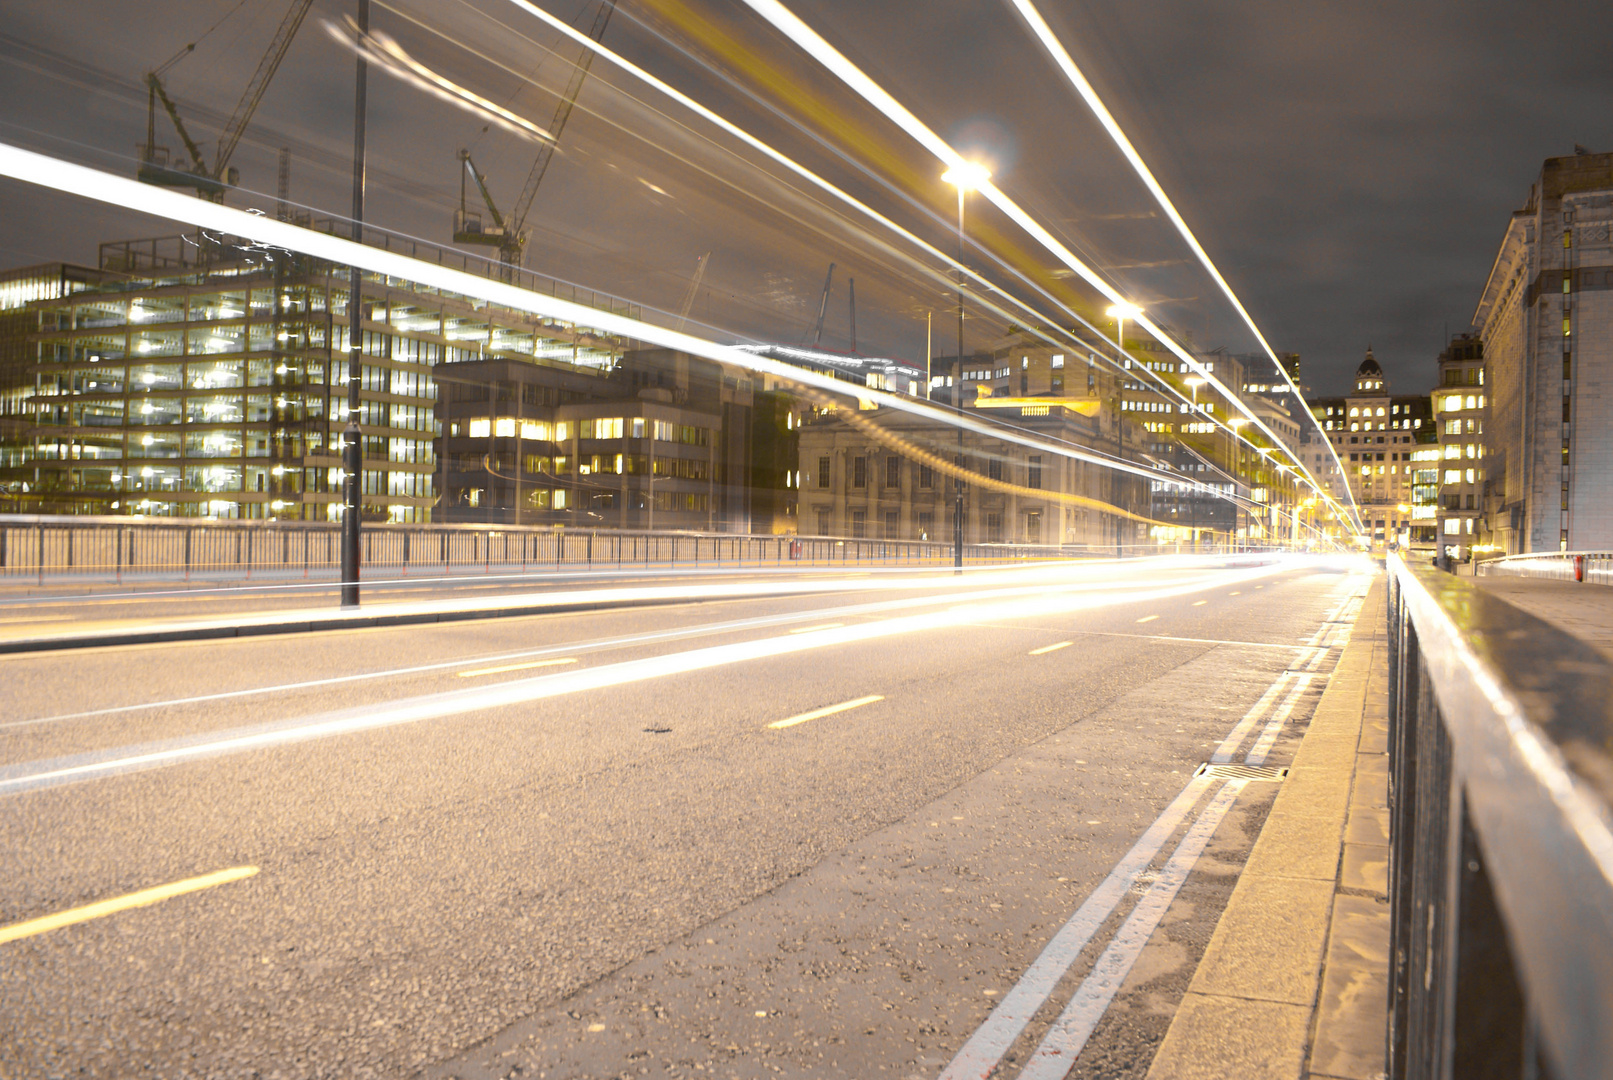 Cars' Lights on the London Bridge